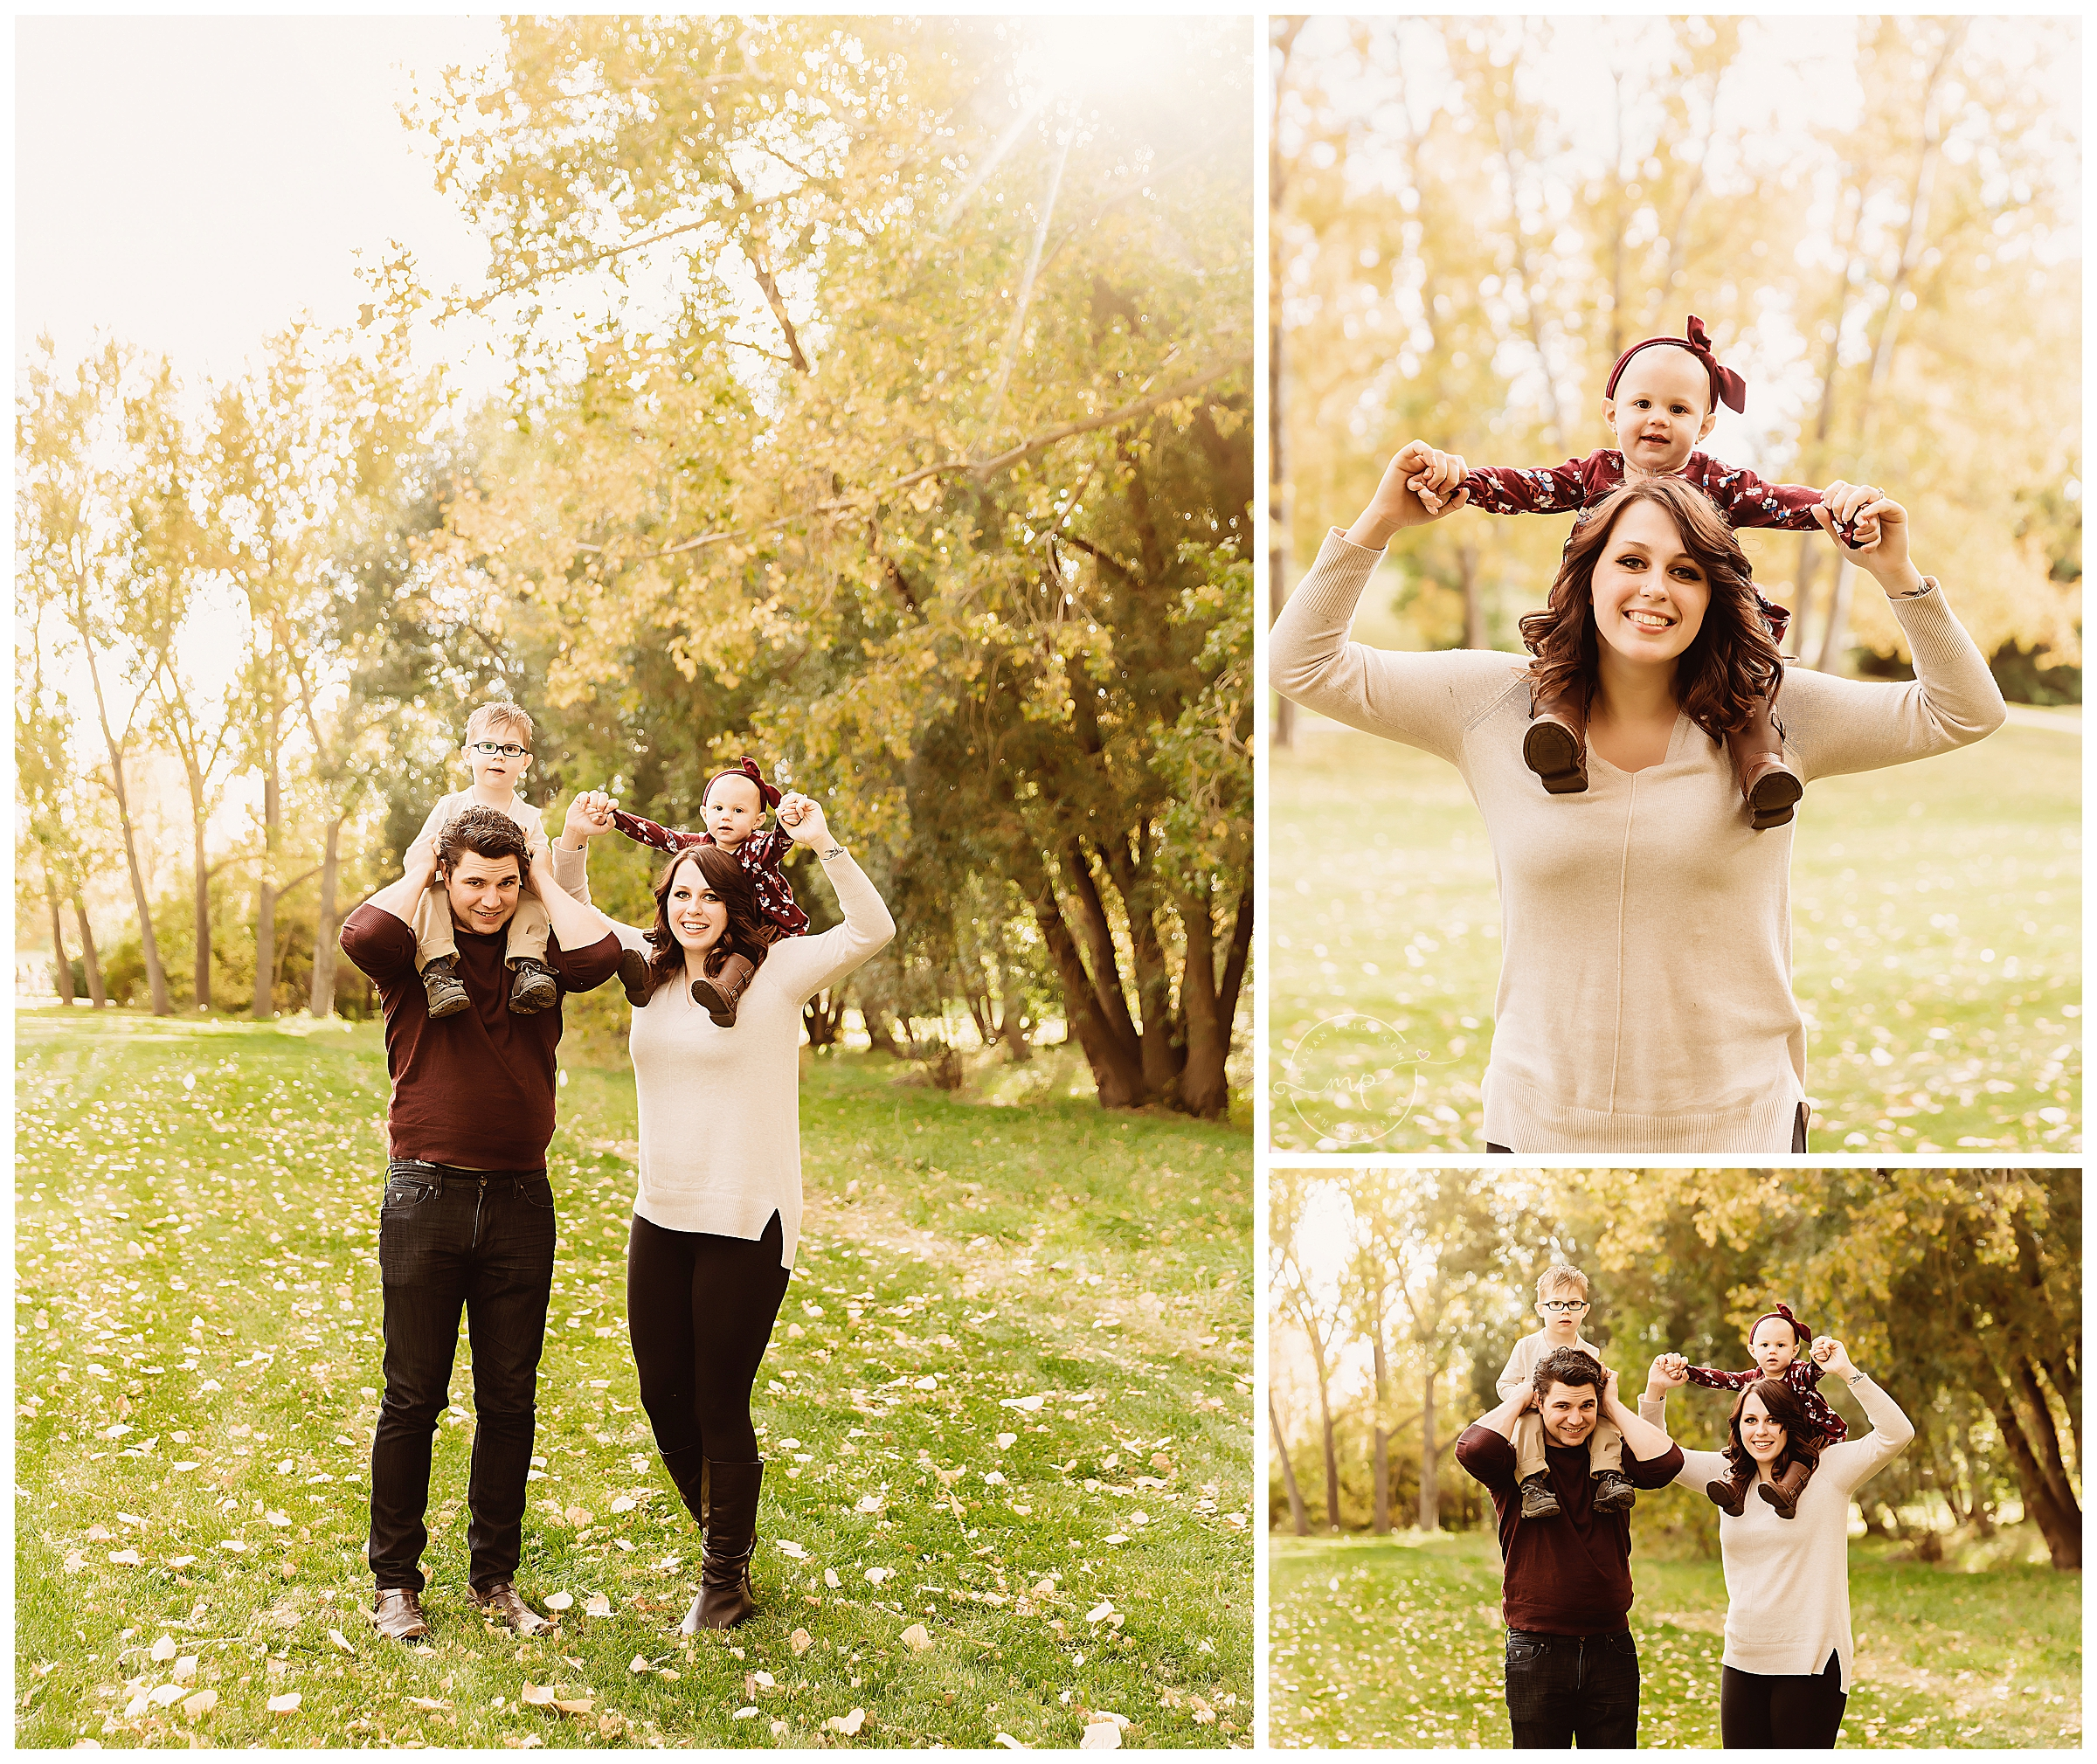 Calgary Fall Family Photo Session at Confederation Park